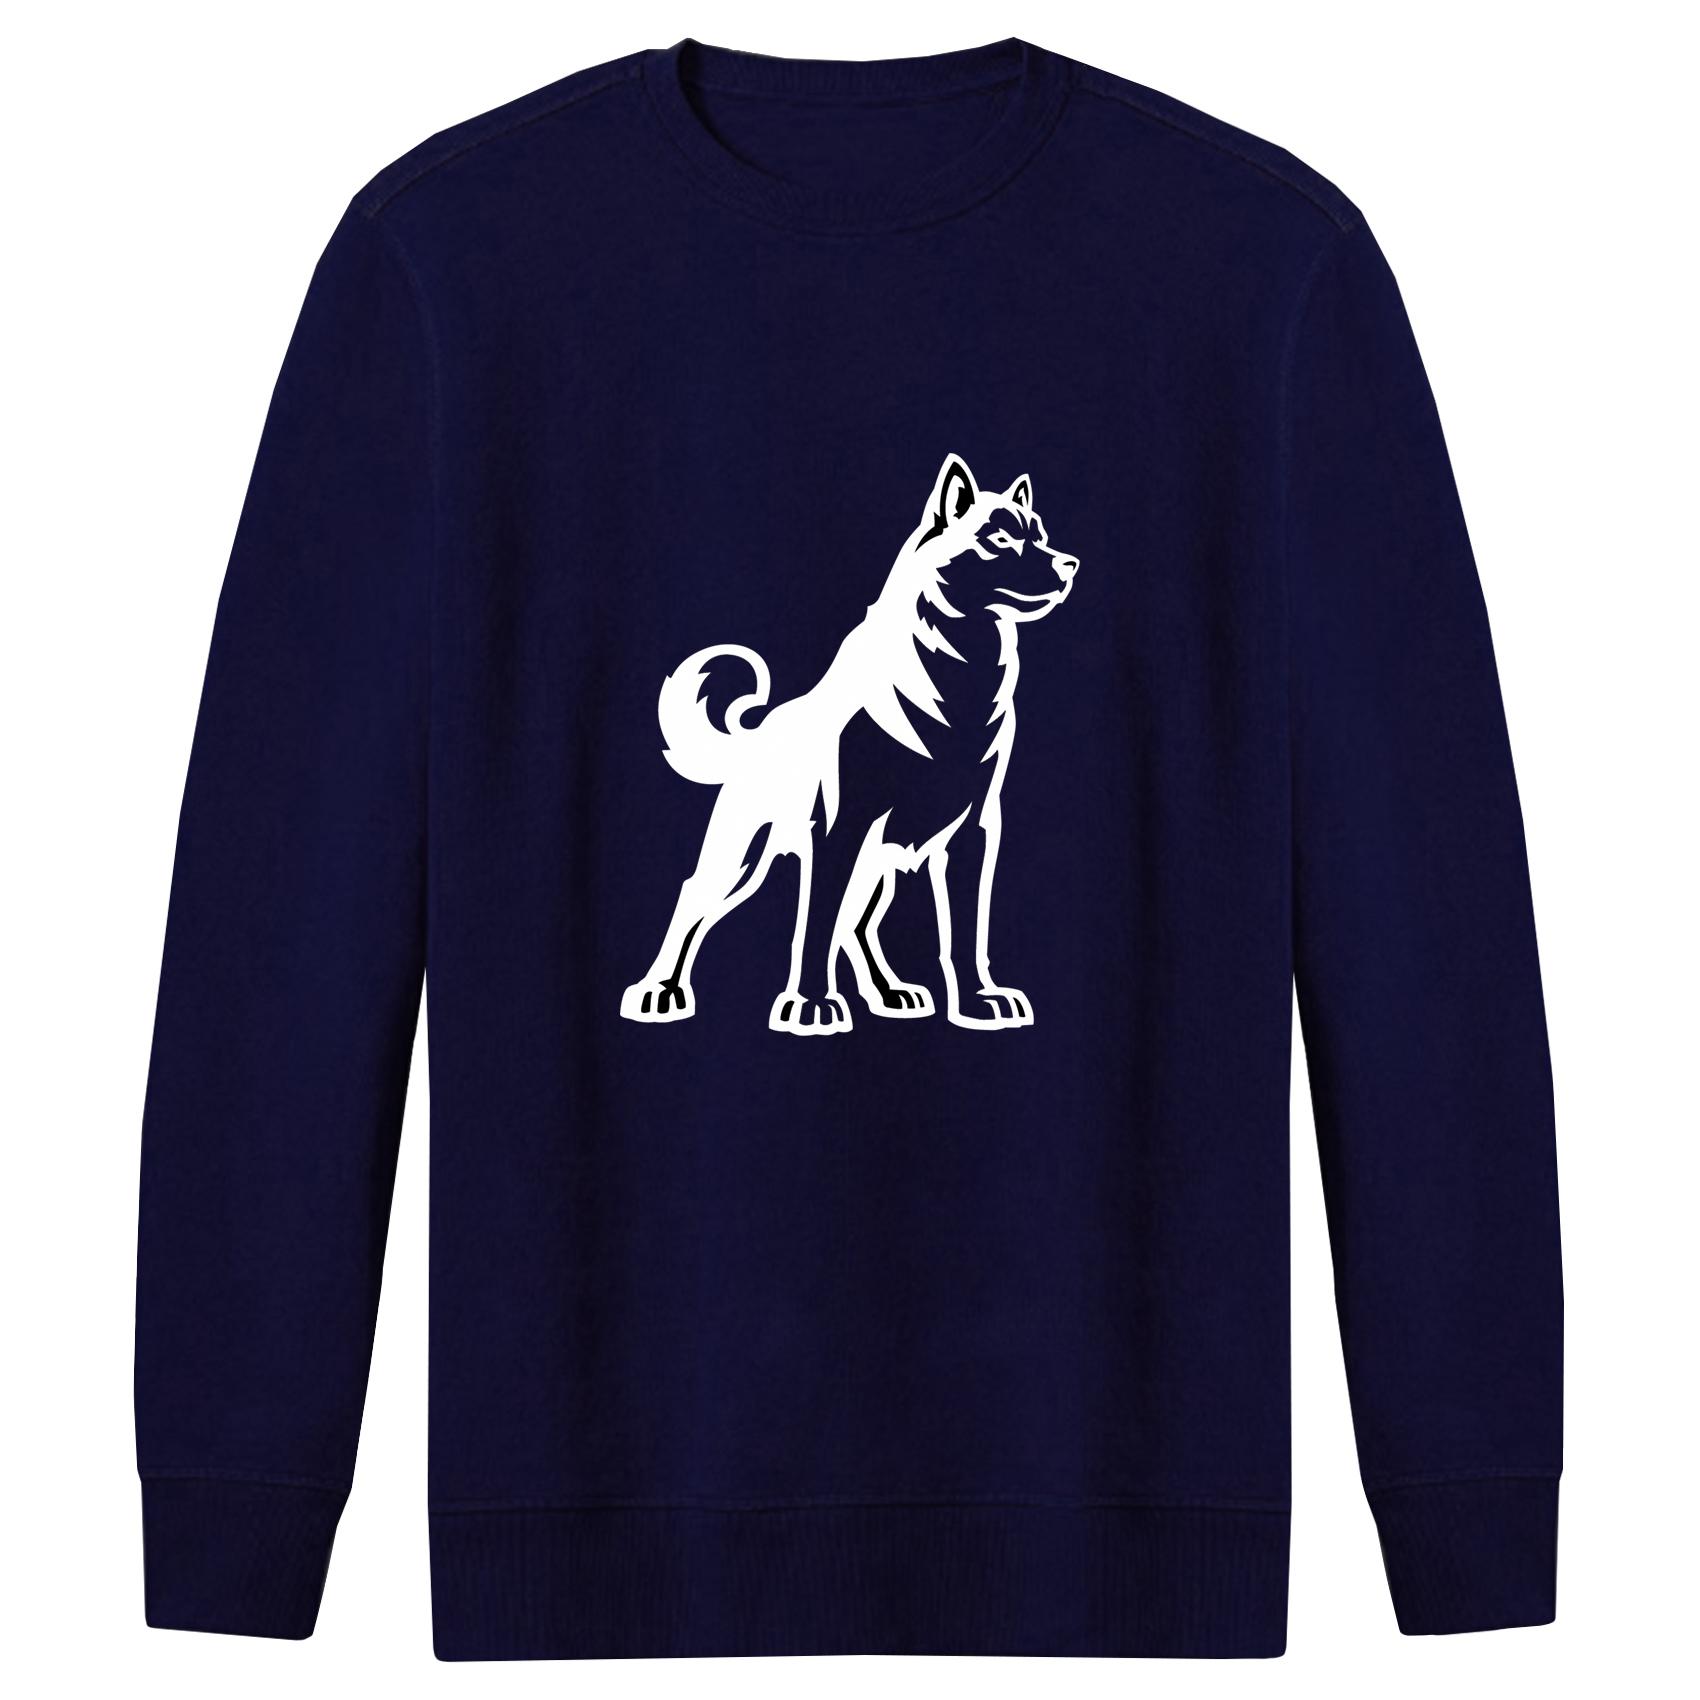 سویشرت مردانه طرح سگ کد F114 رنگ سرمه ای